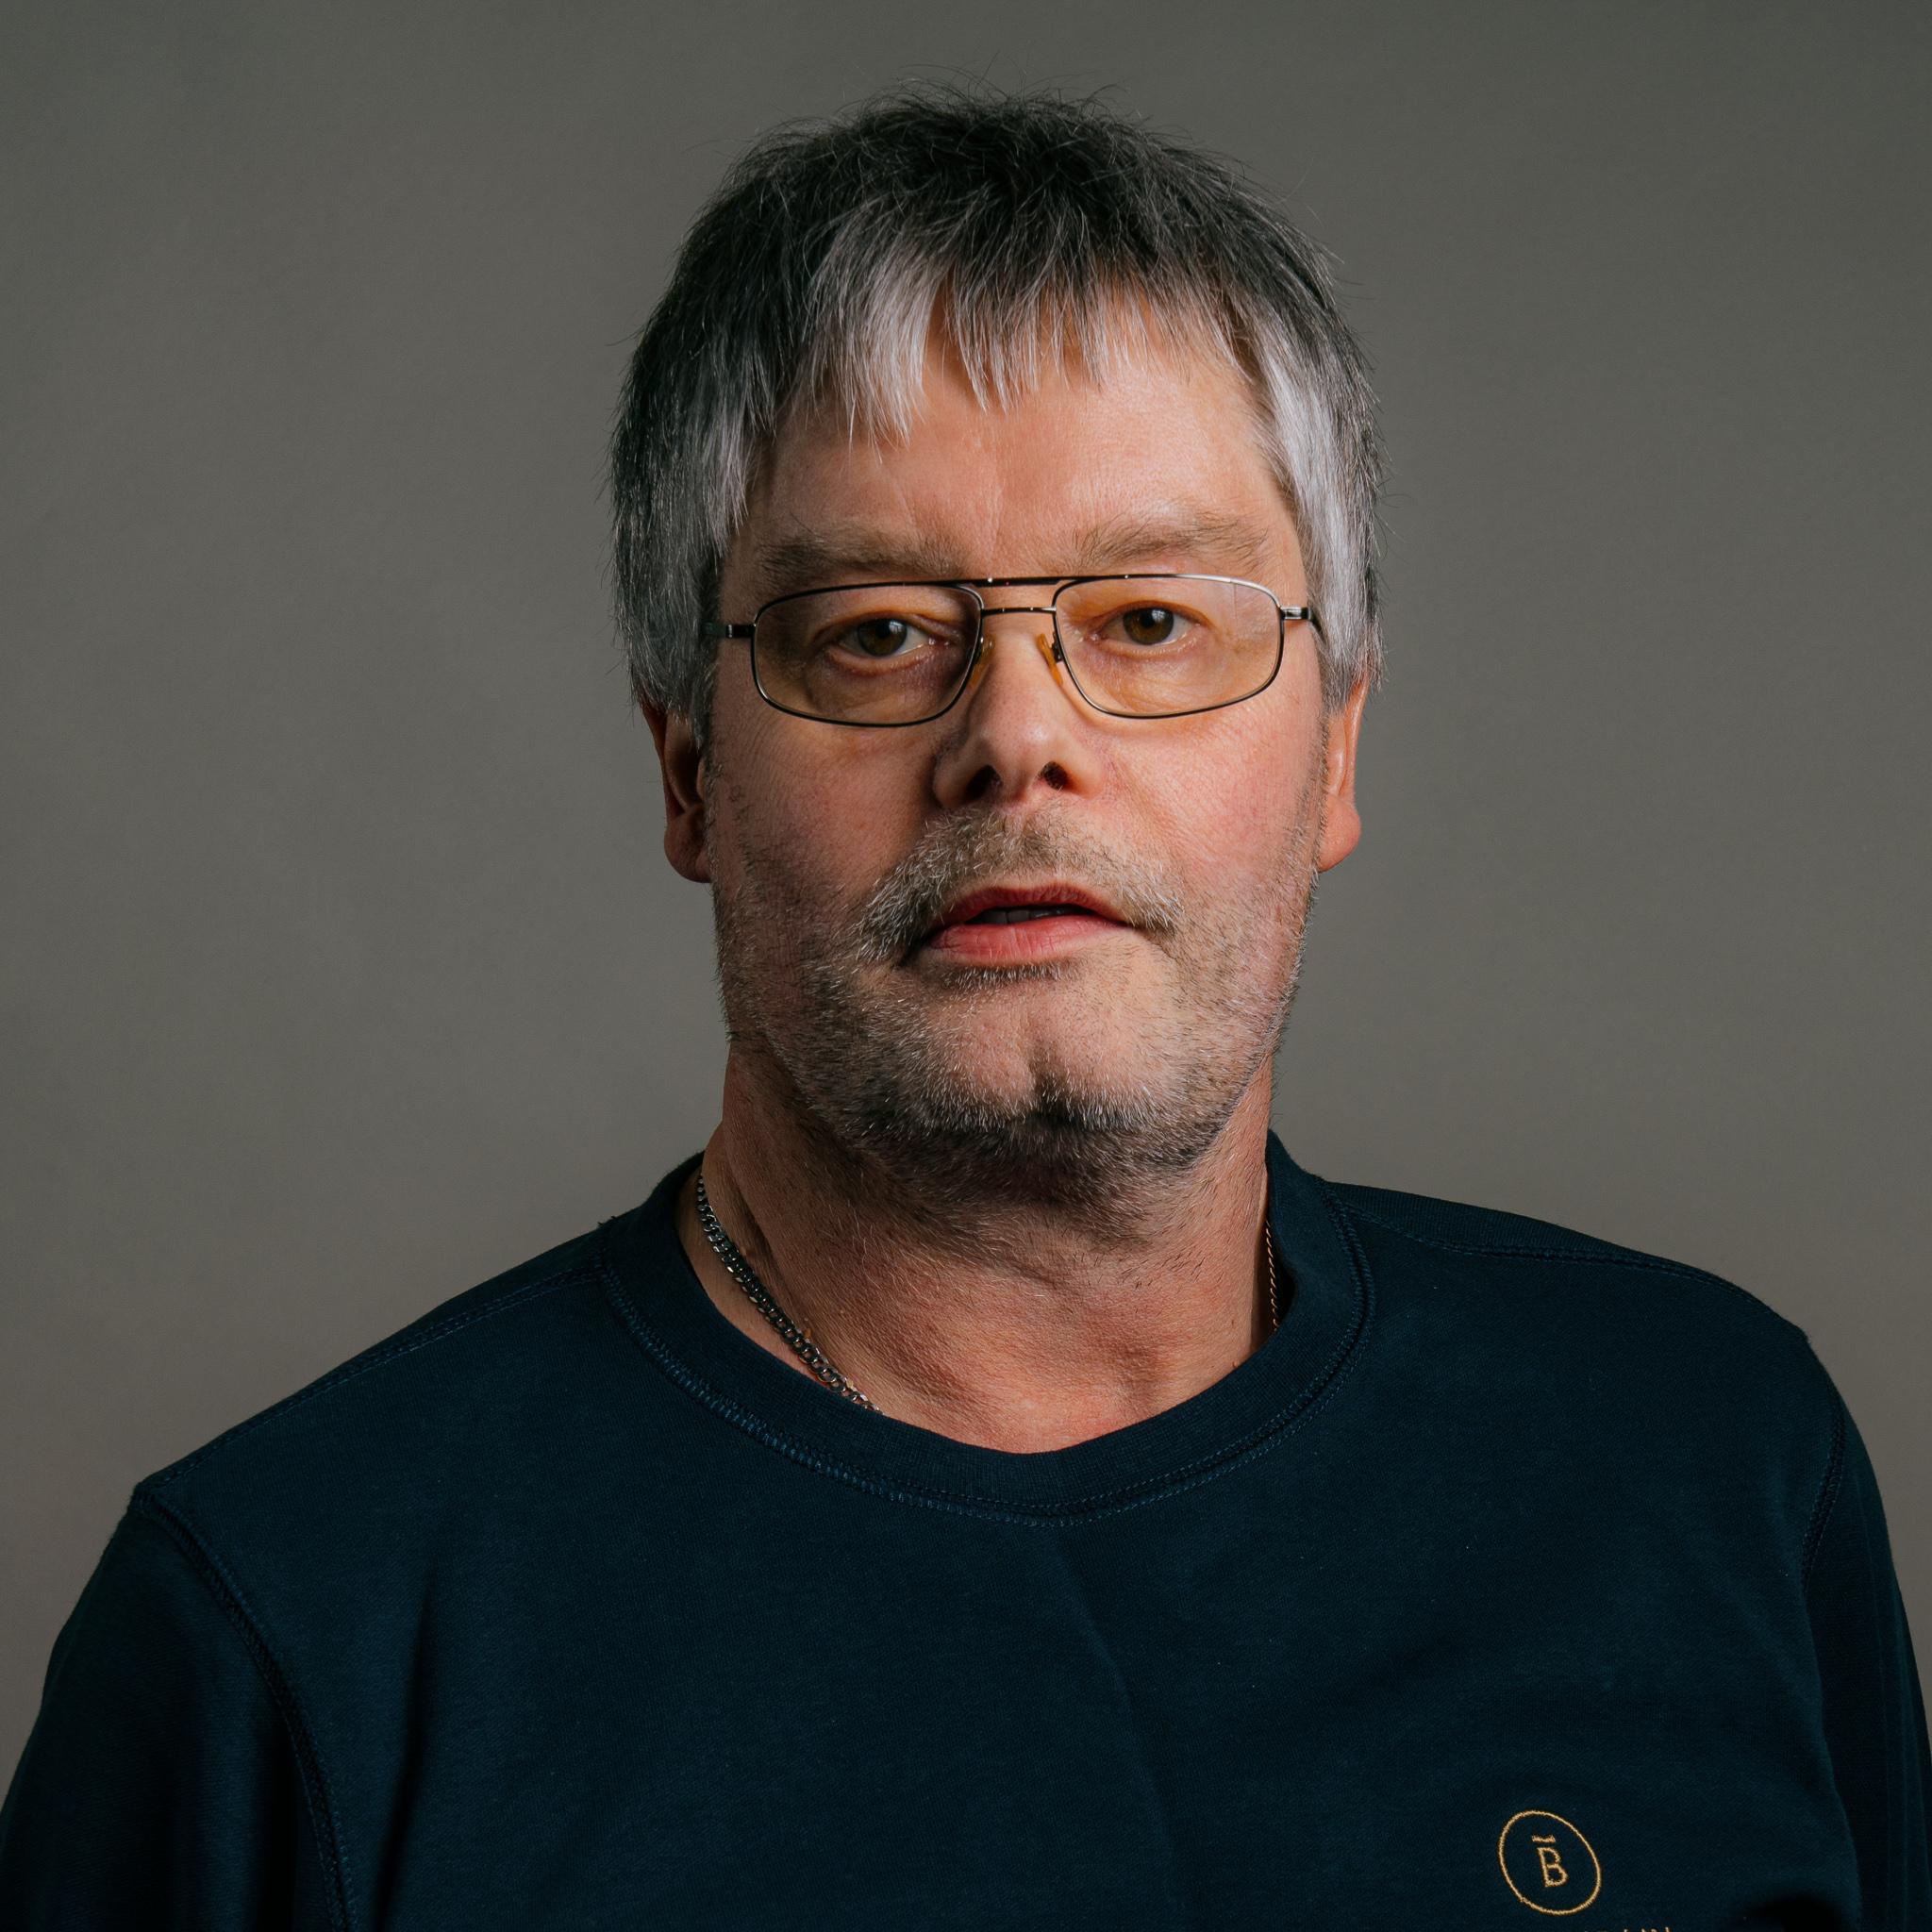 Jan-Erik Johansson